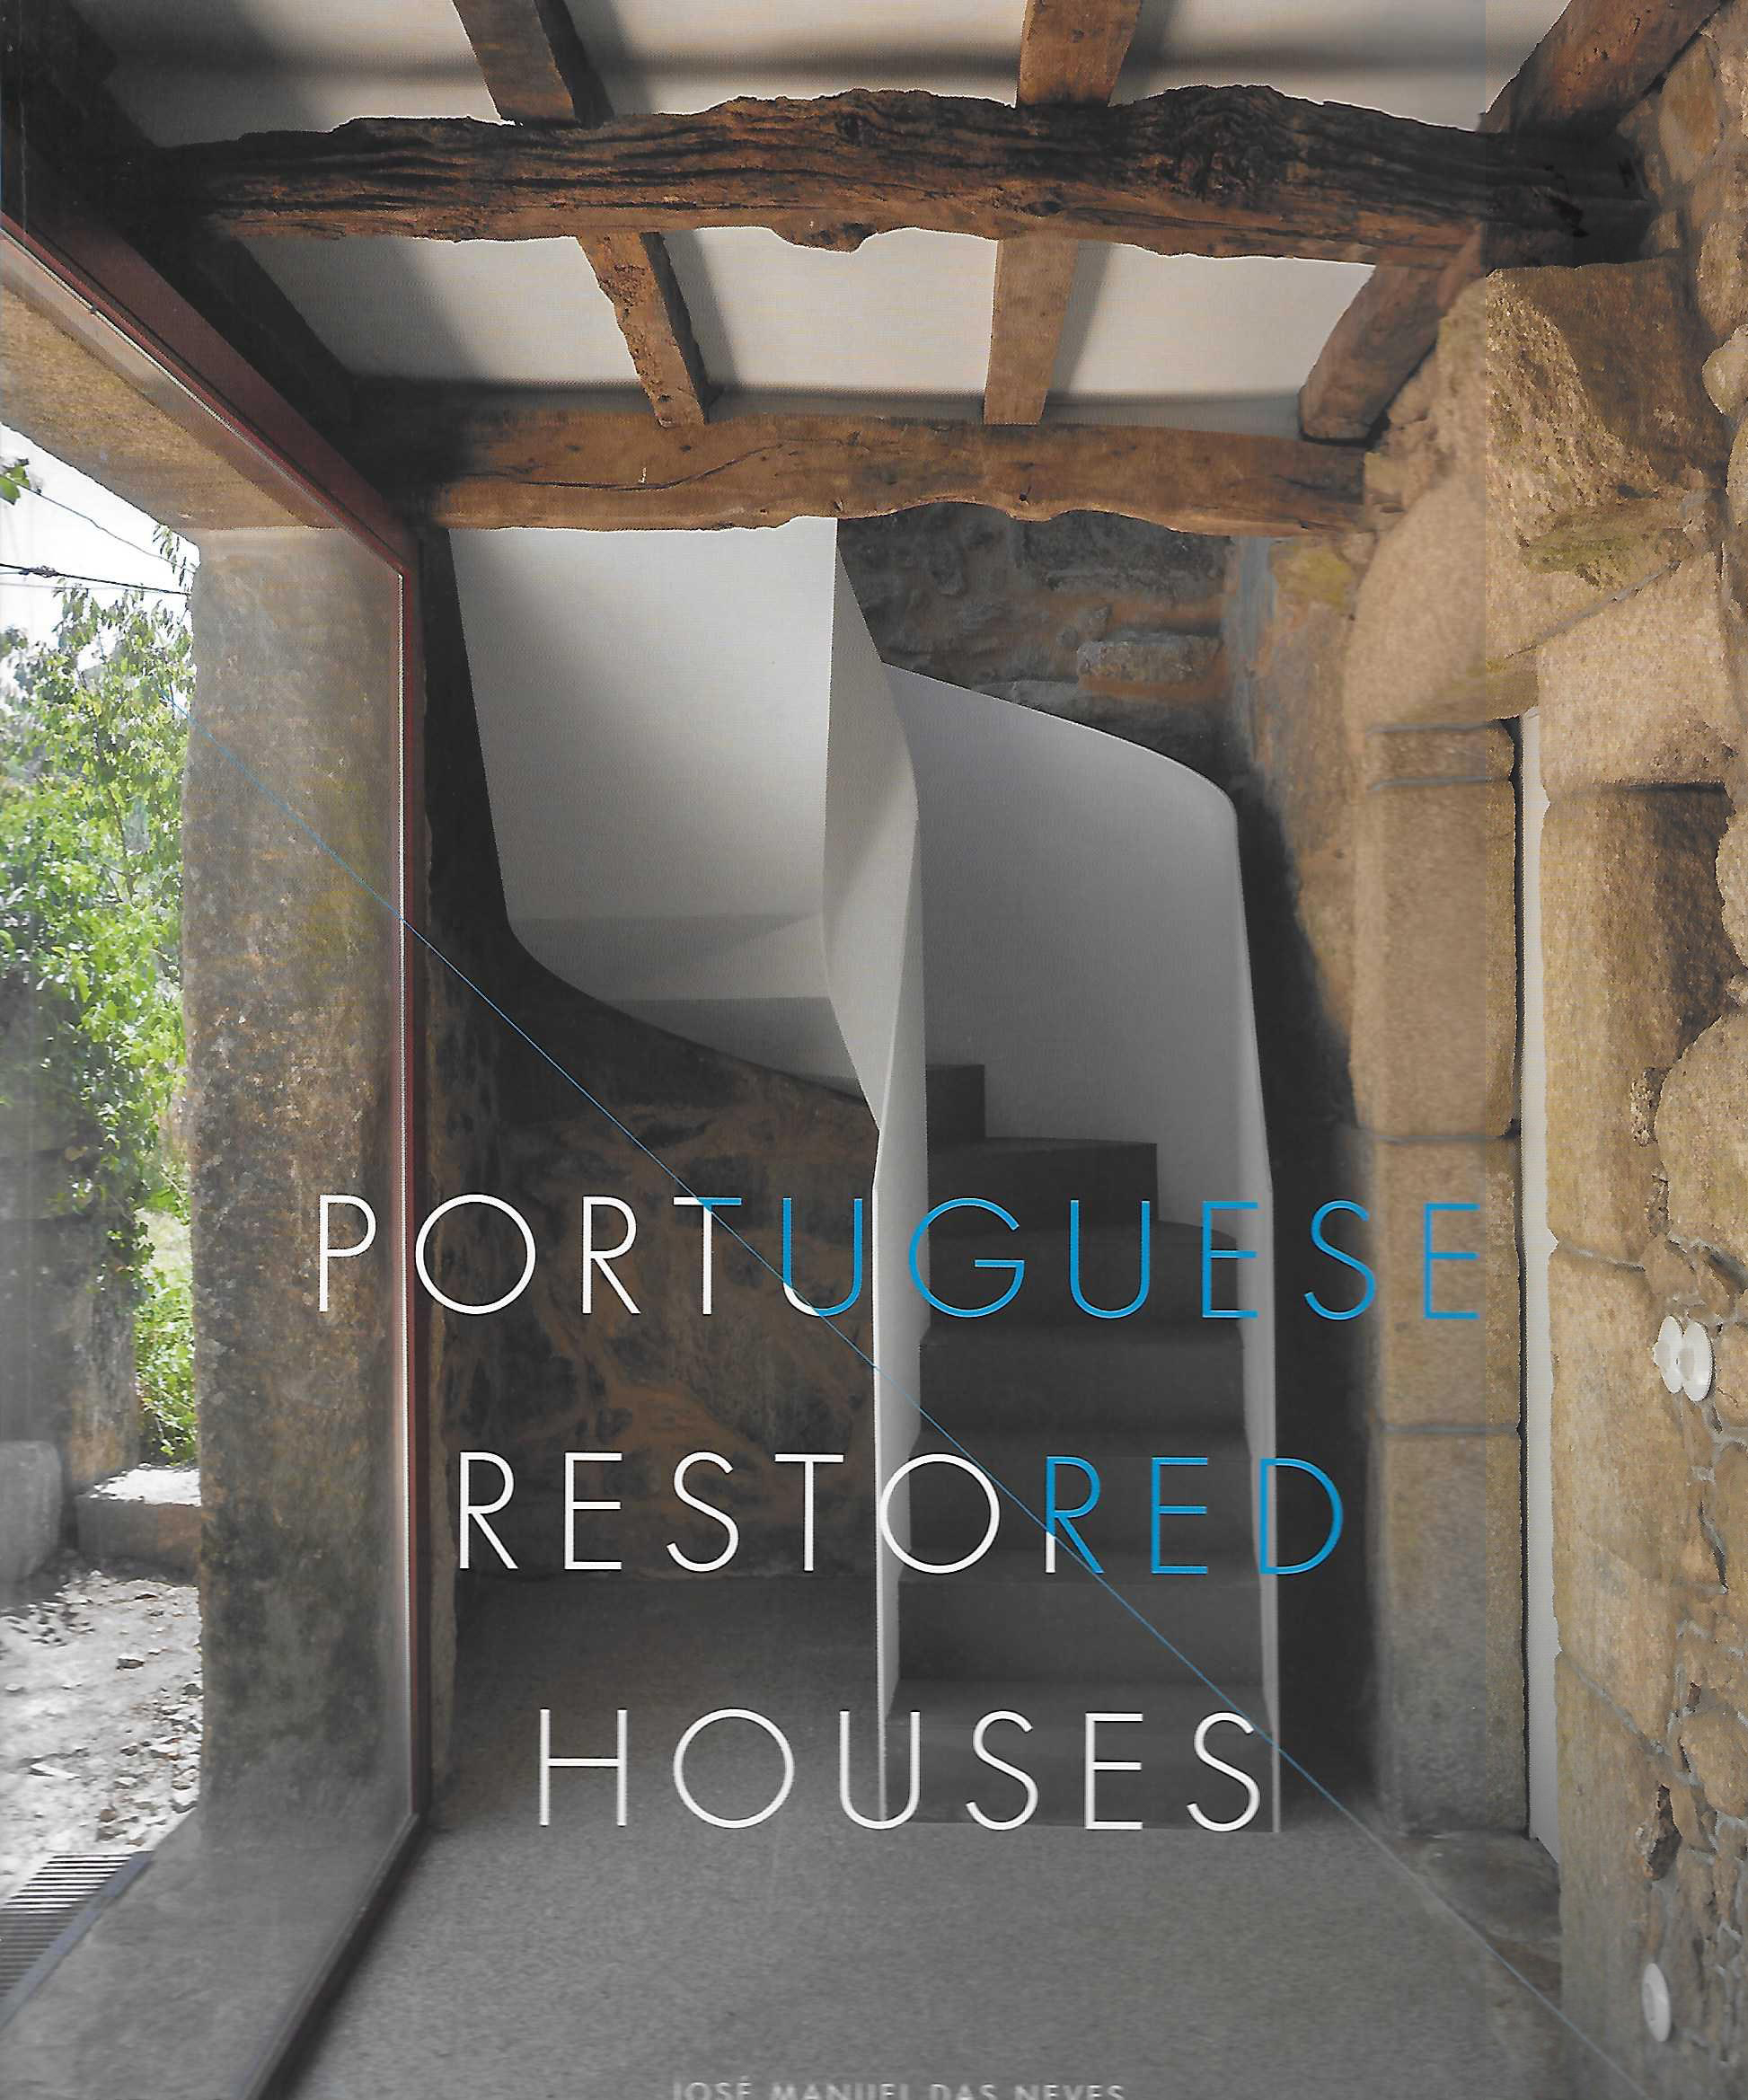 CASACLARA-PORTUGUESE RESTORED HOUSES.jpg